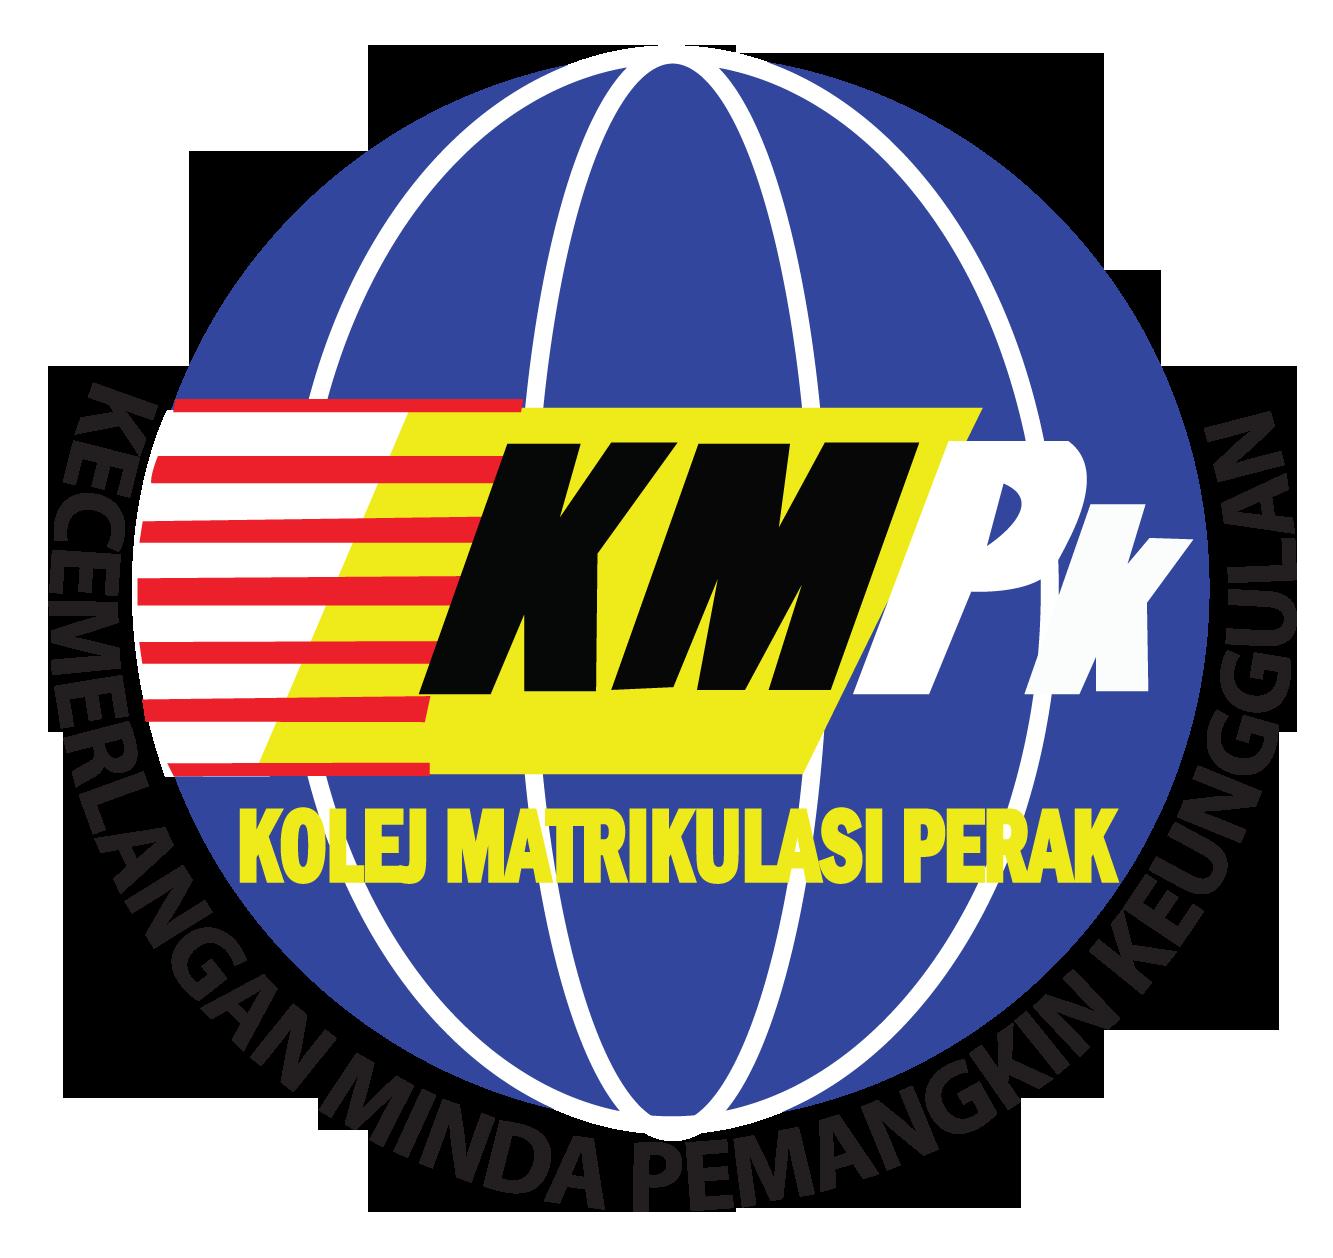 Kolej Matrikulasi Perak Wikipedia Bahasa Melayu Ensiklopedia Bebas